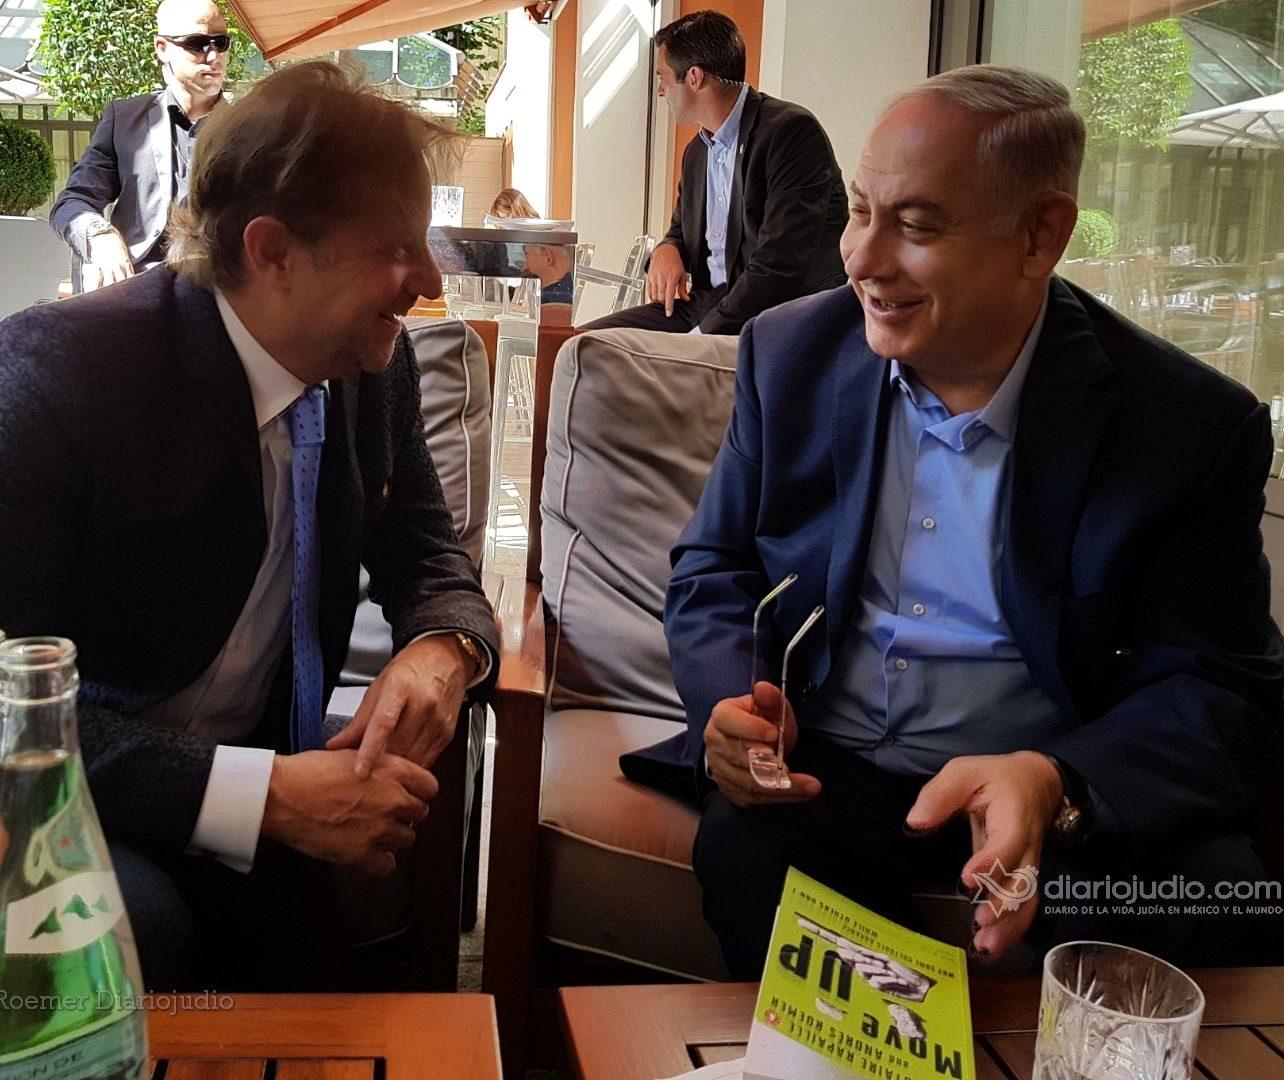 Netanyahu Roemer